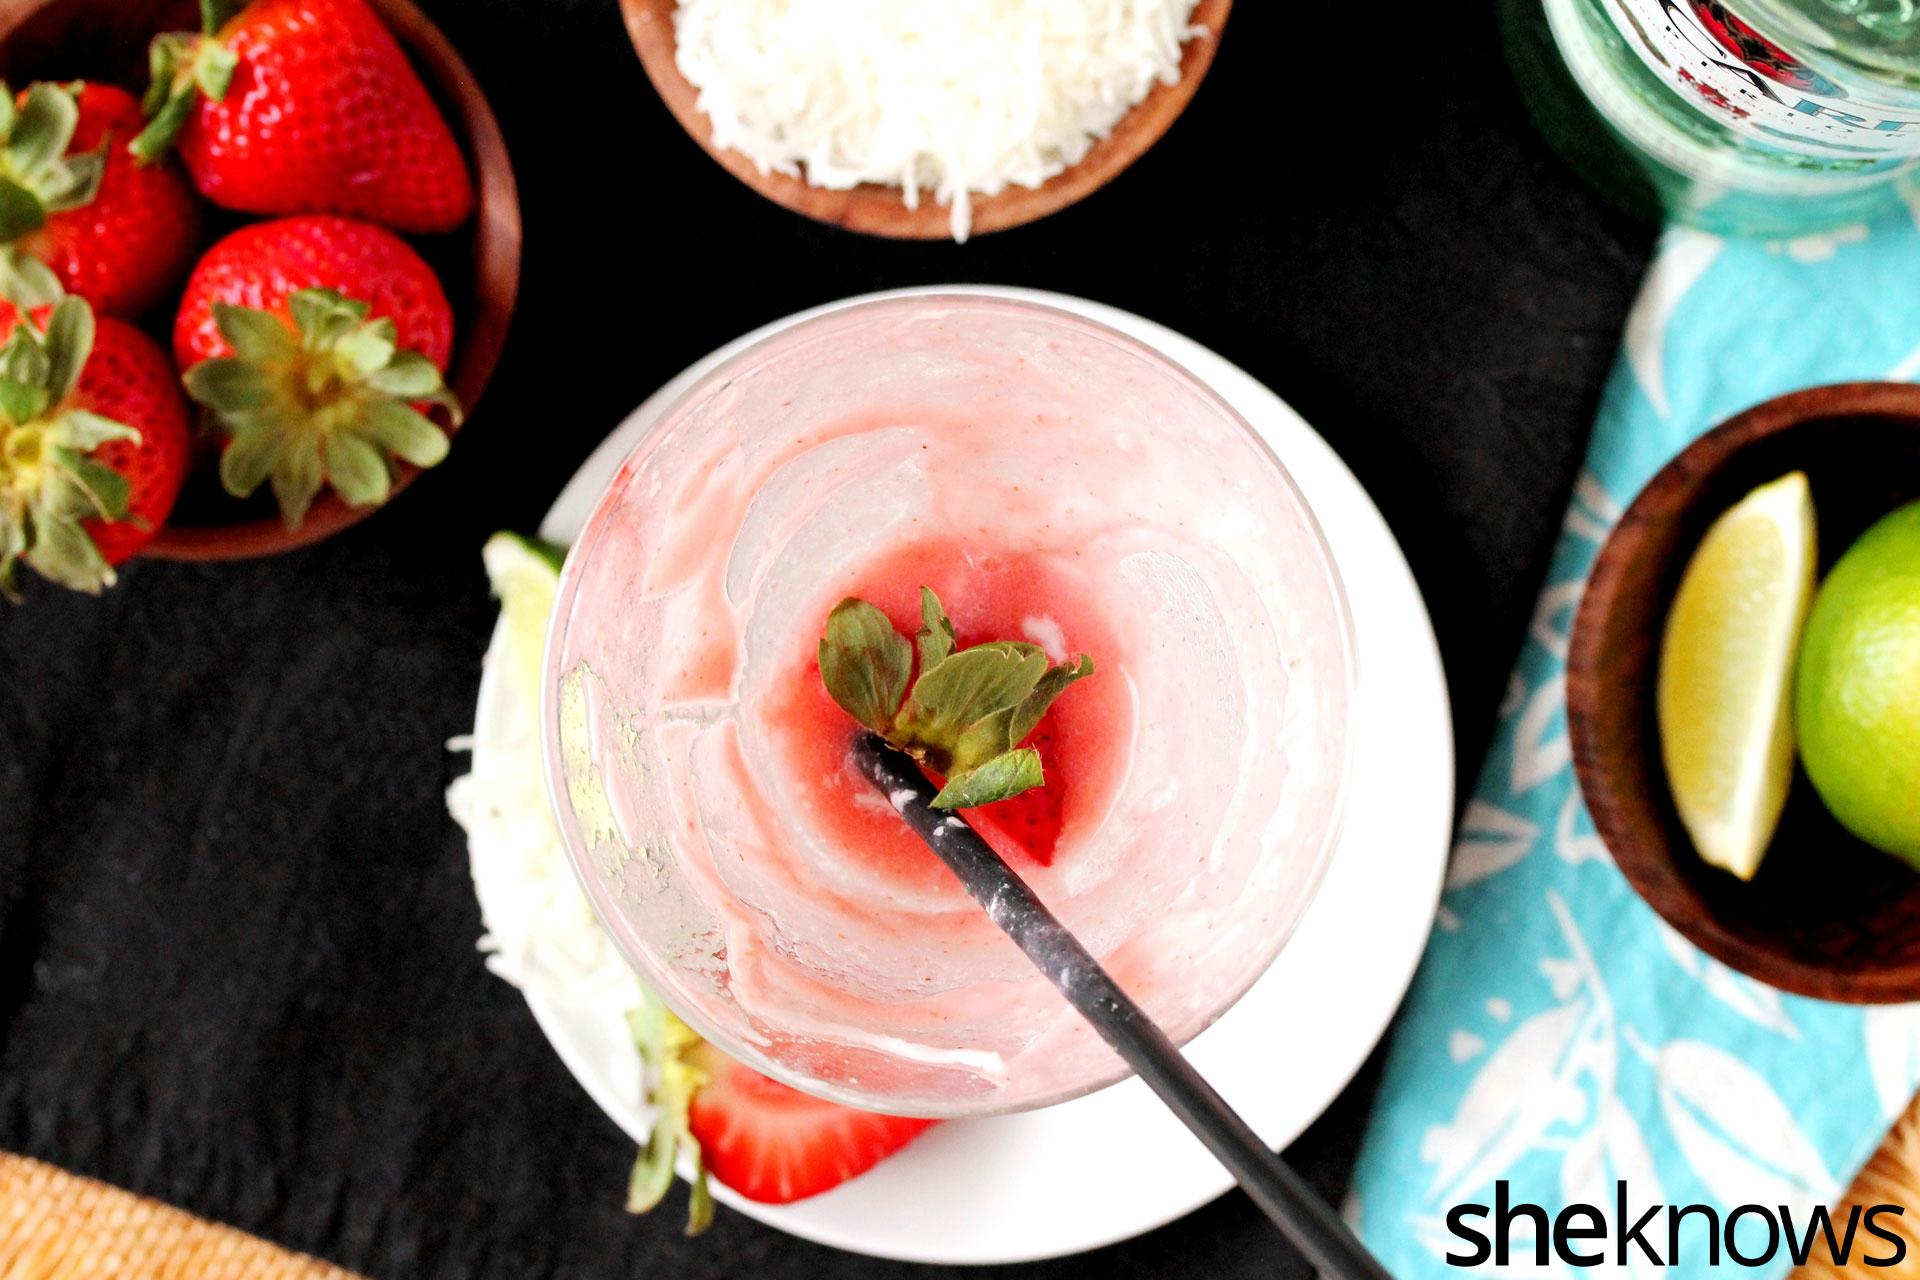 strawberry swirl daiquiri with straw